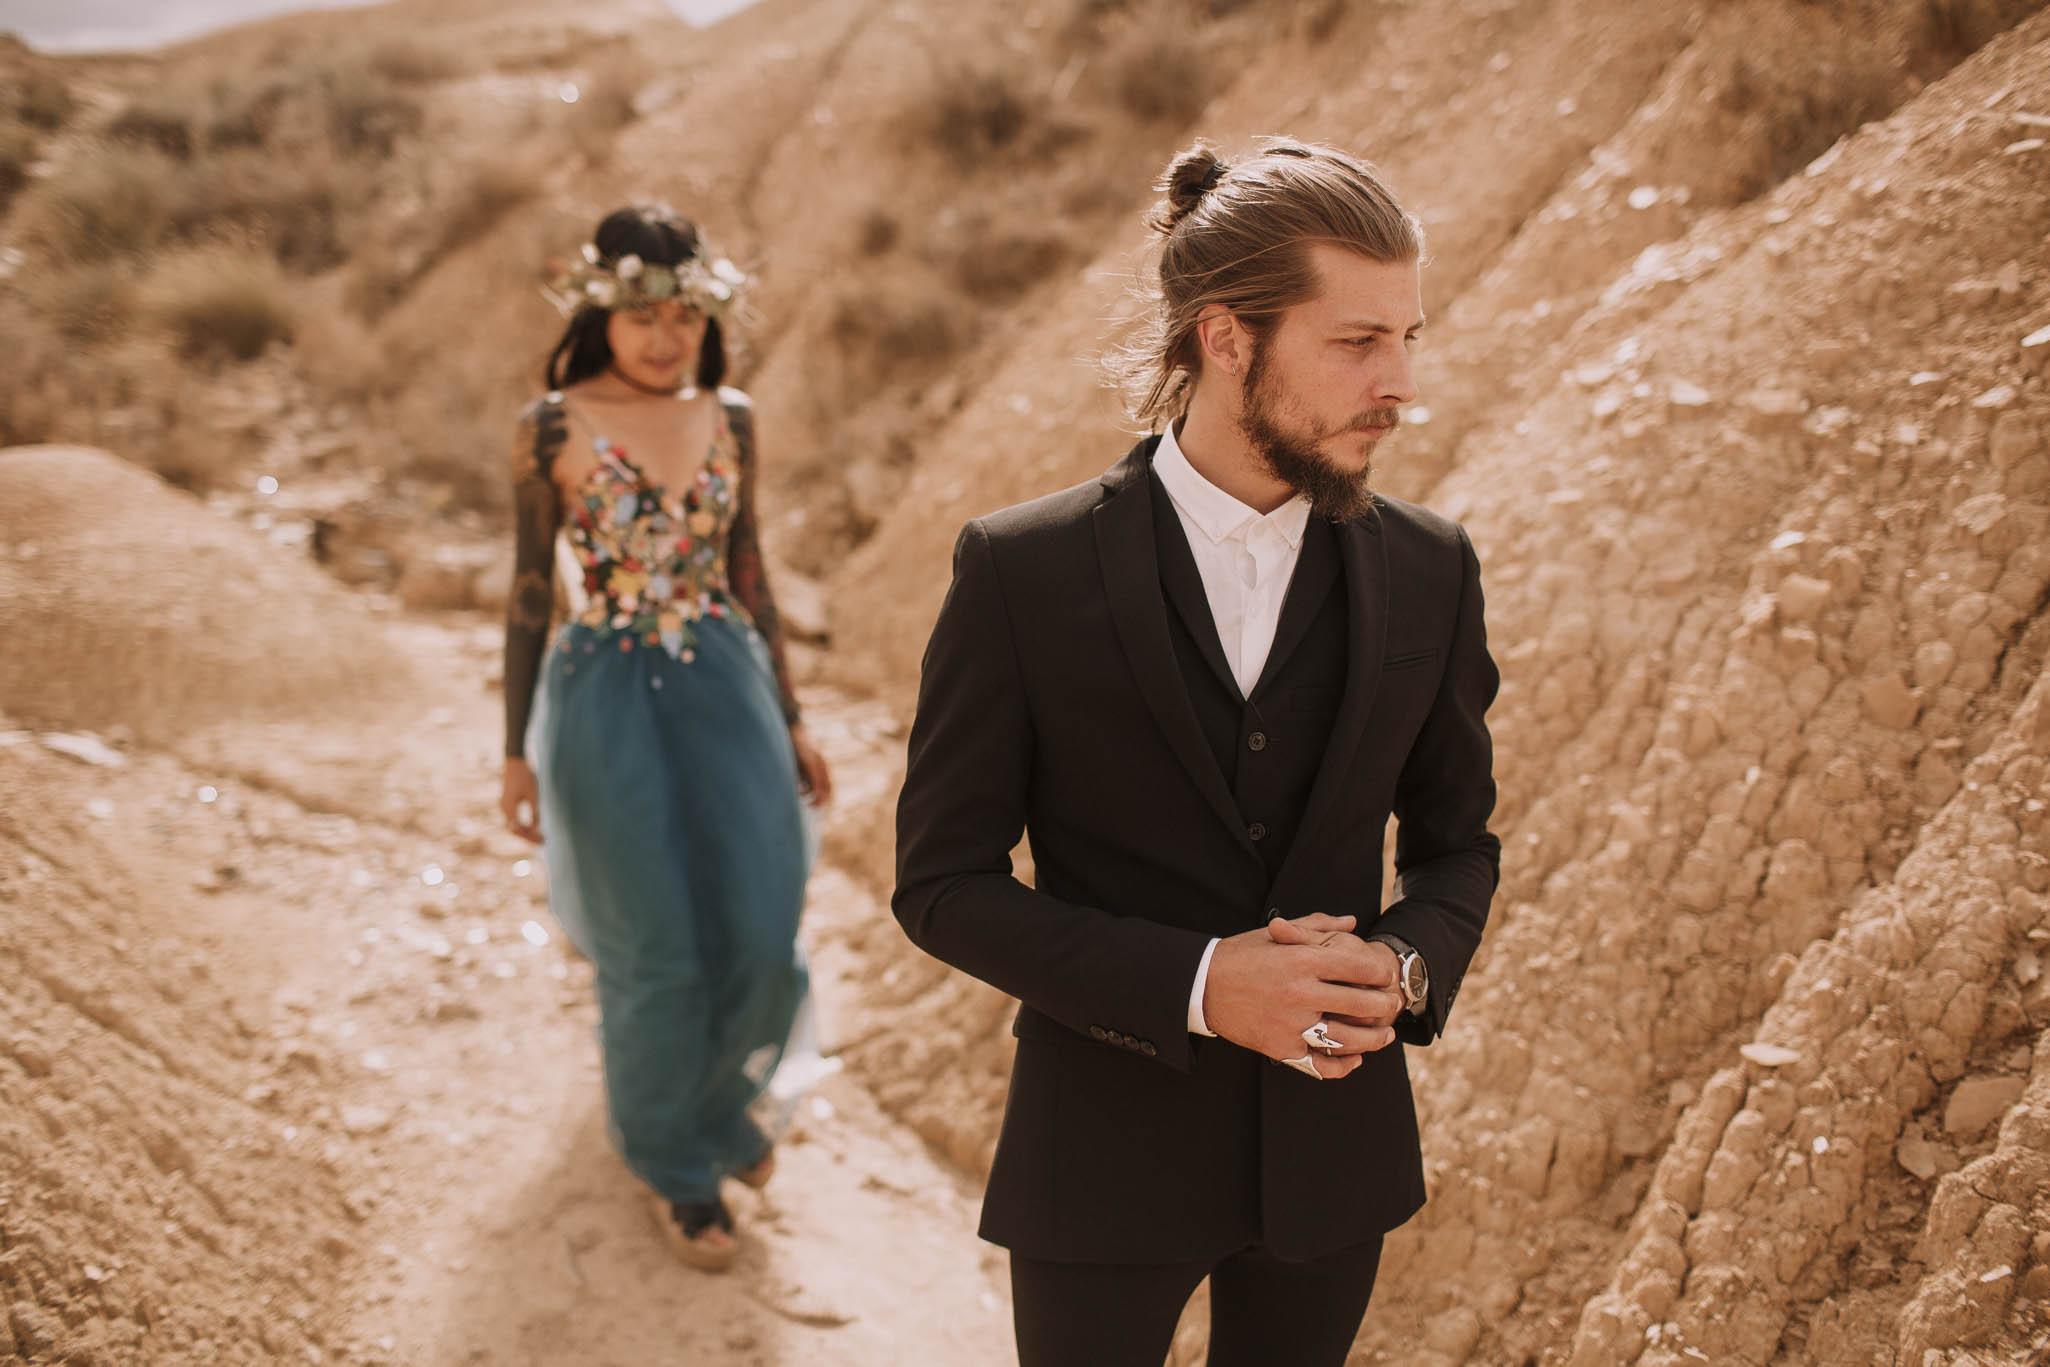 Spain-wedding-photographer-bardenas-reales-jeremy-boyer-photographe-mariage-bordeaux-floral-wedding-dress-robe-75.jpg